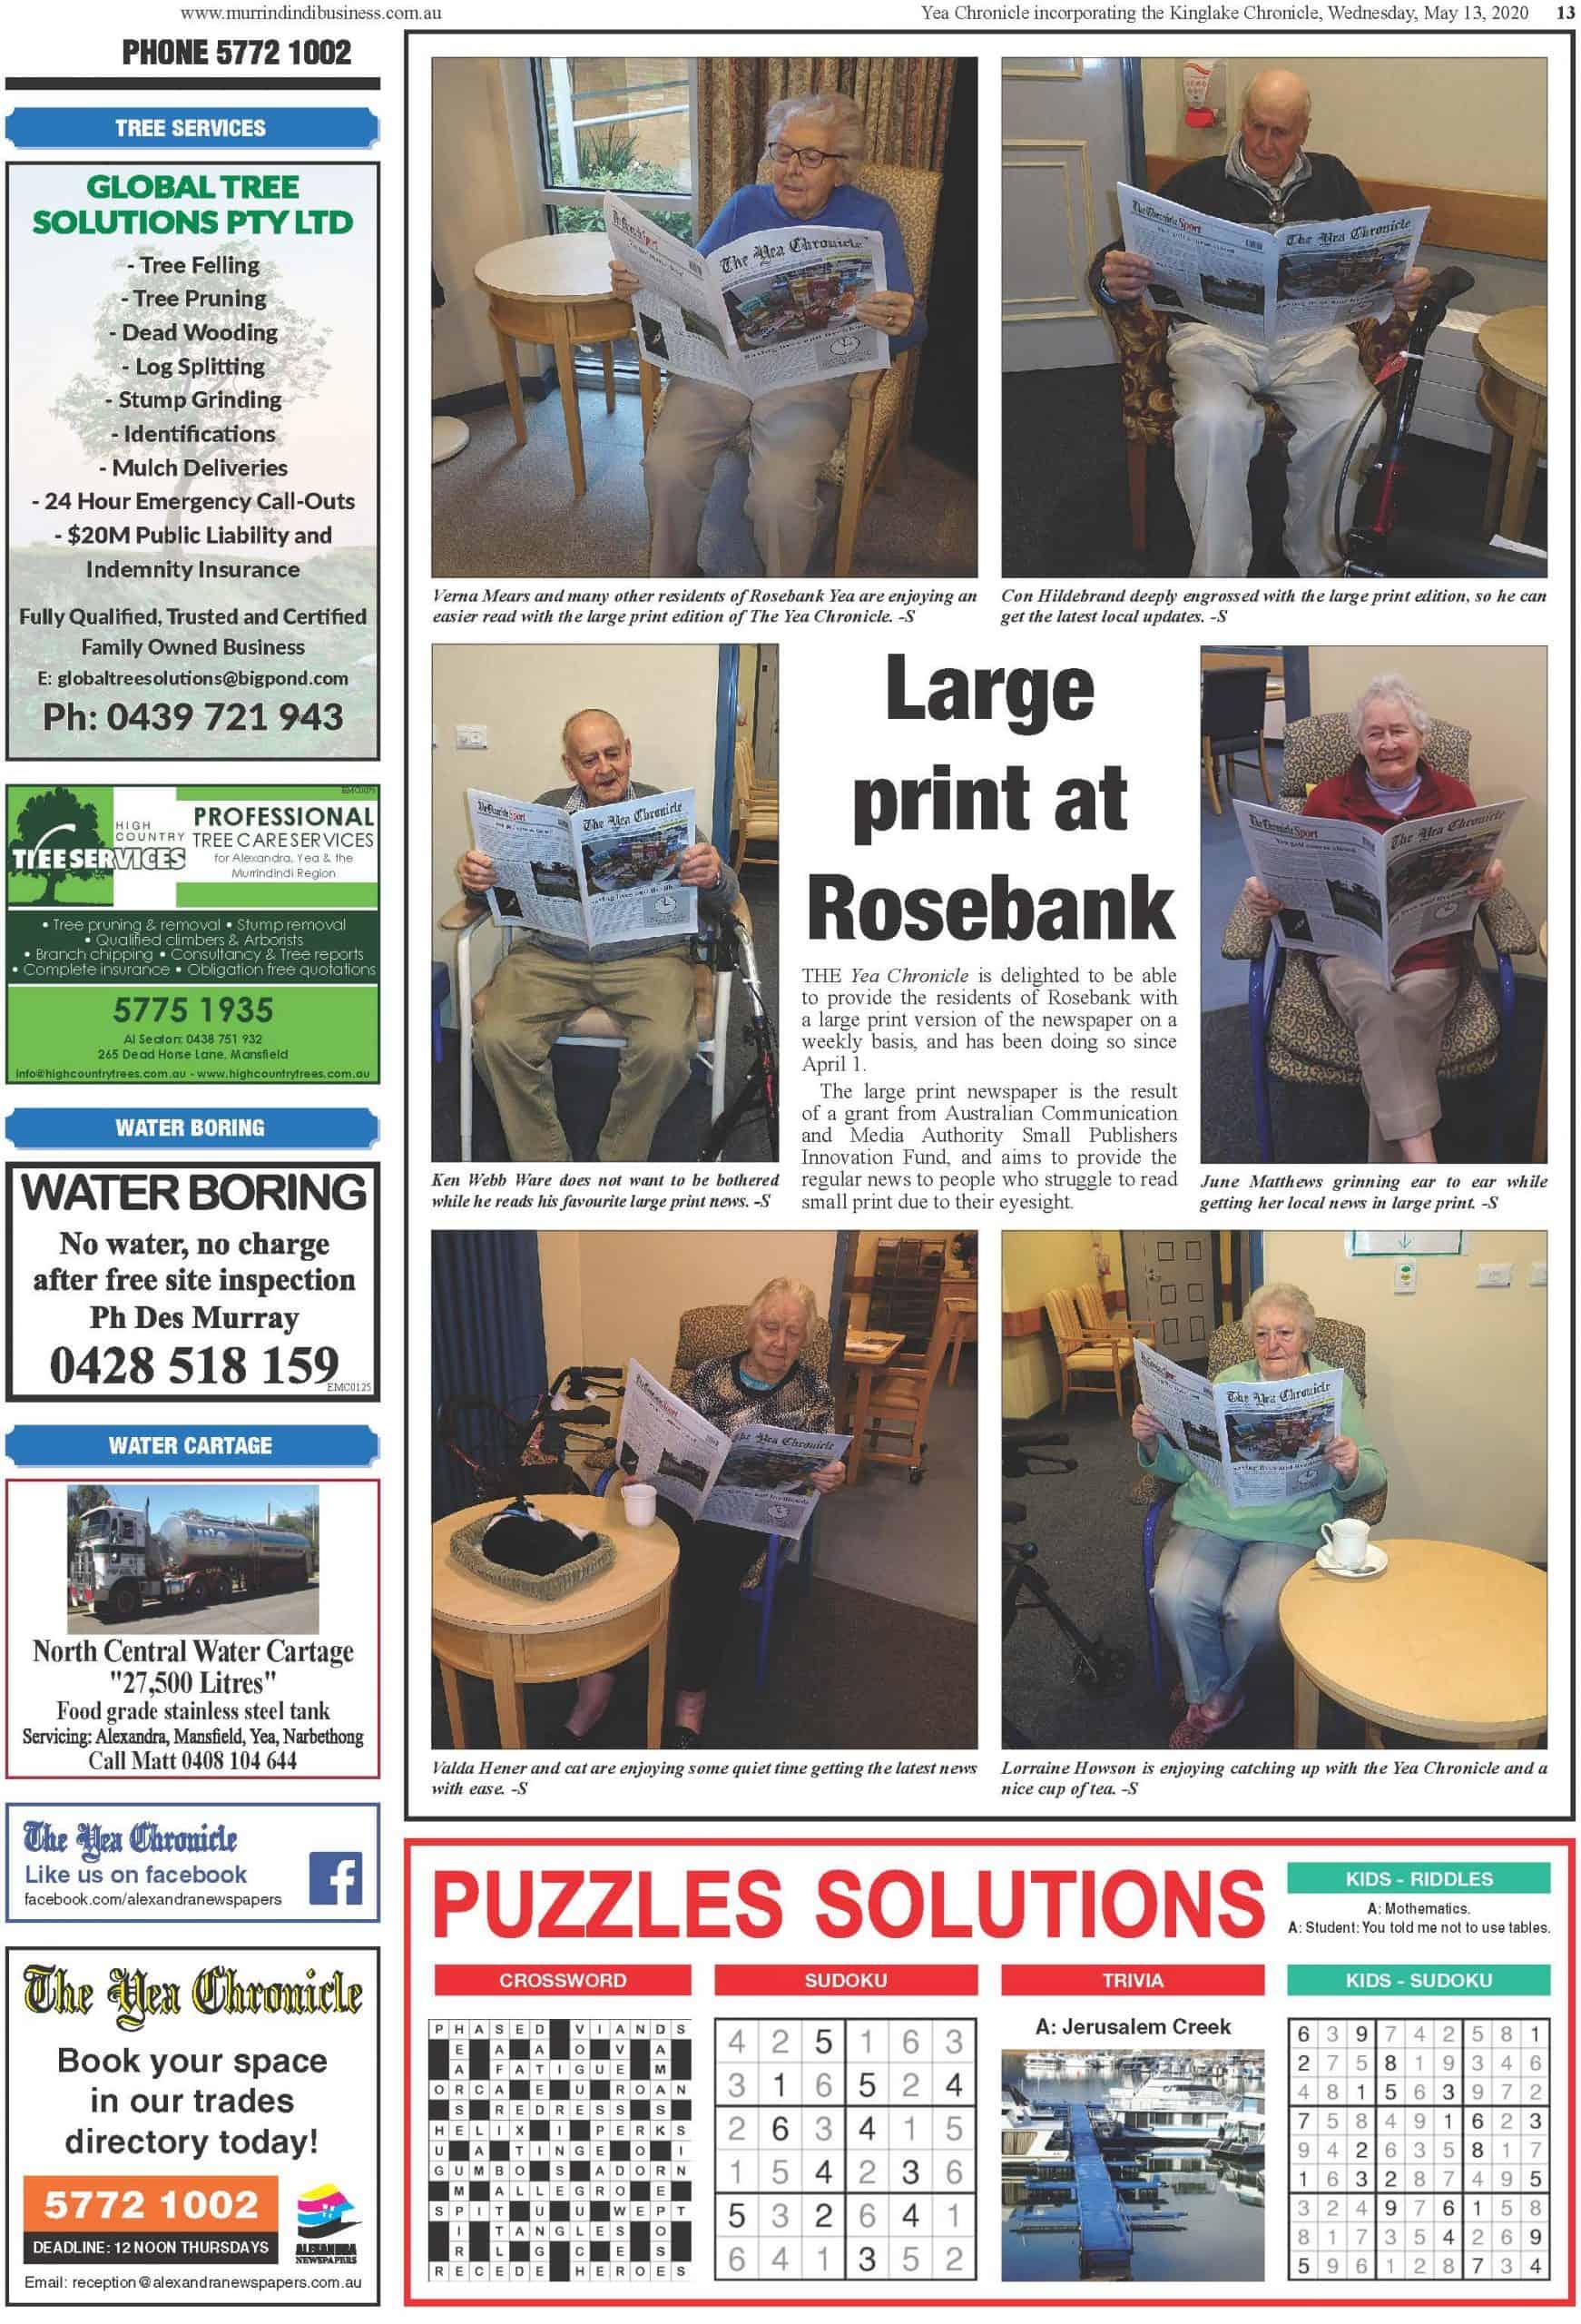 Large print Rosebank